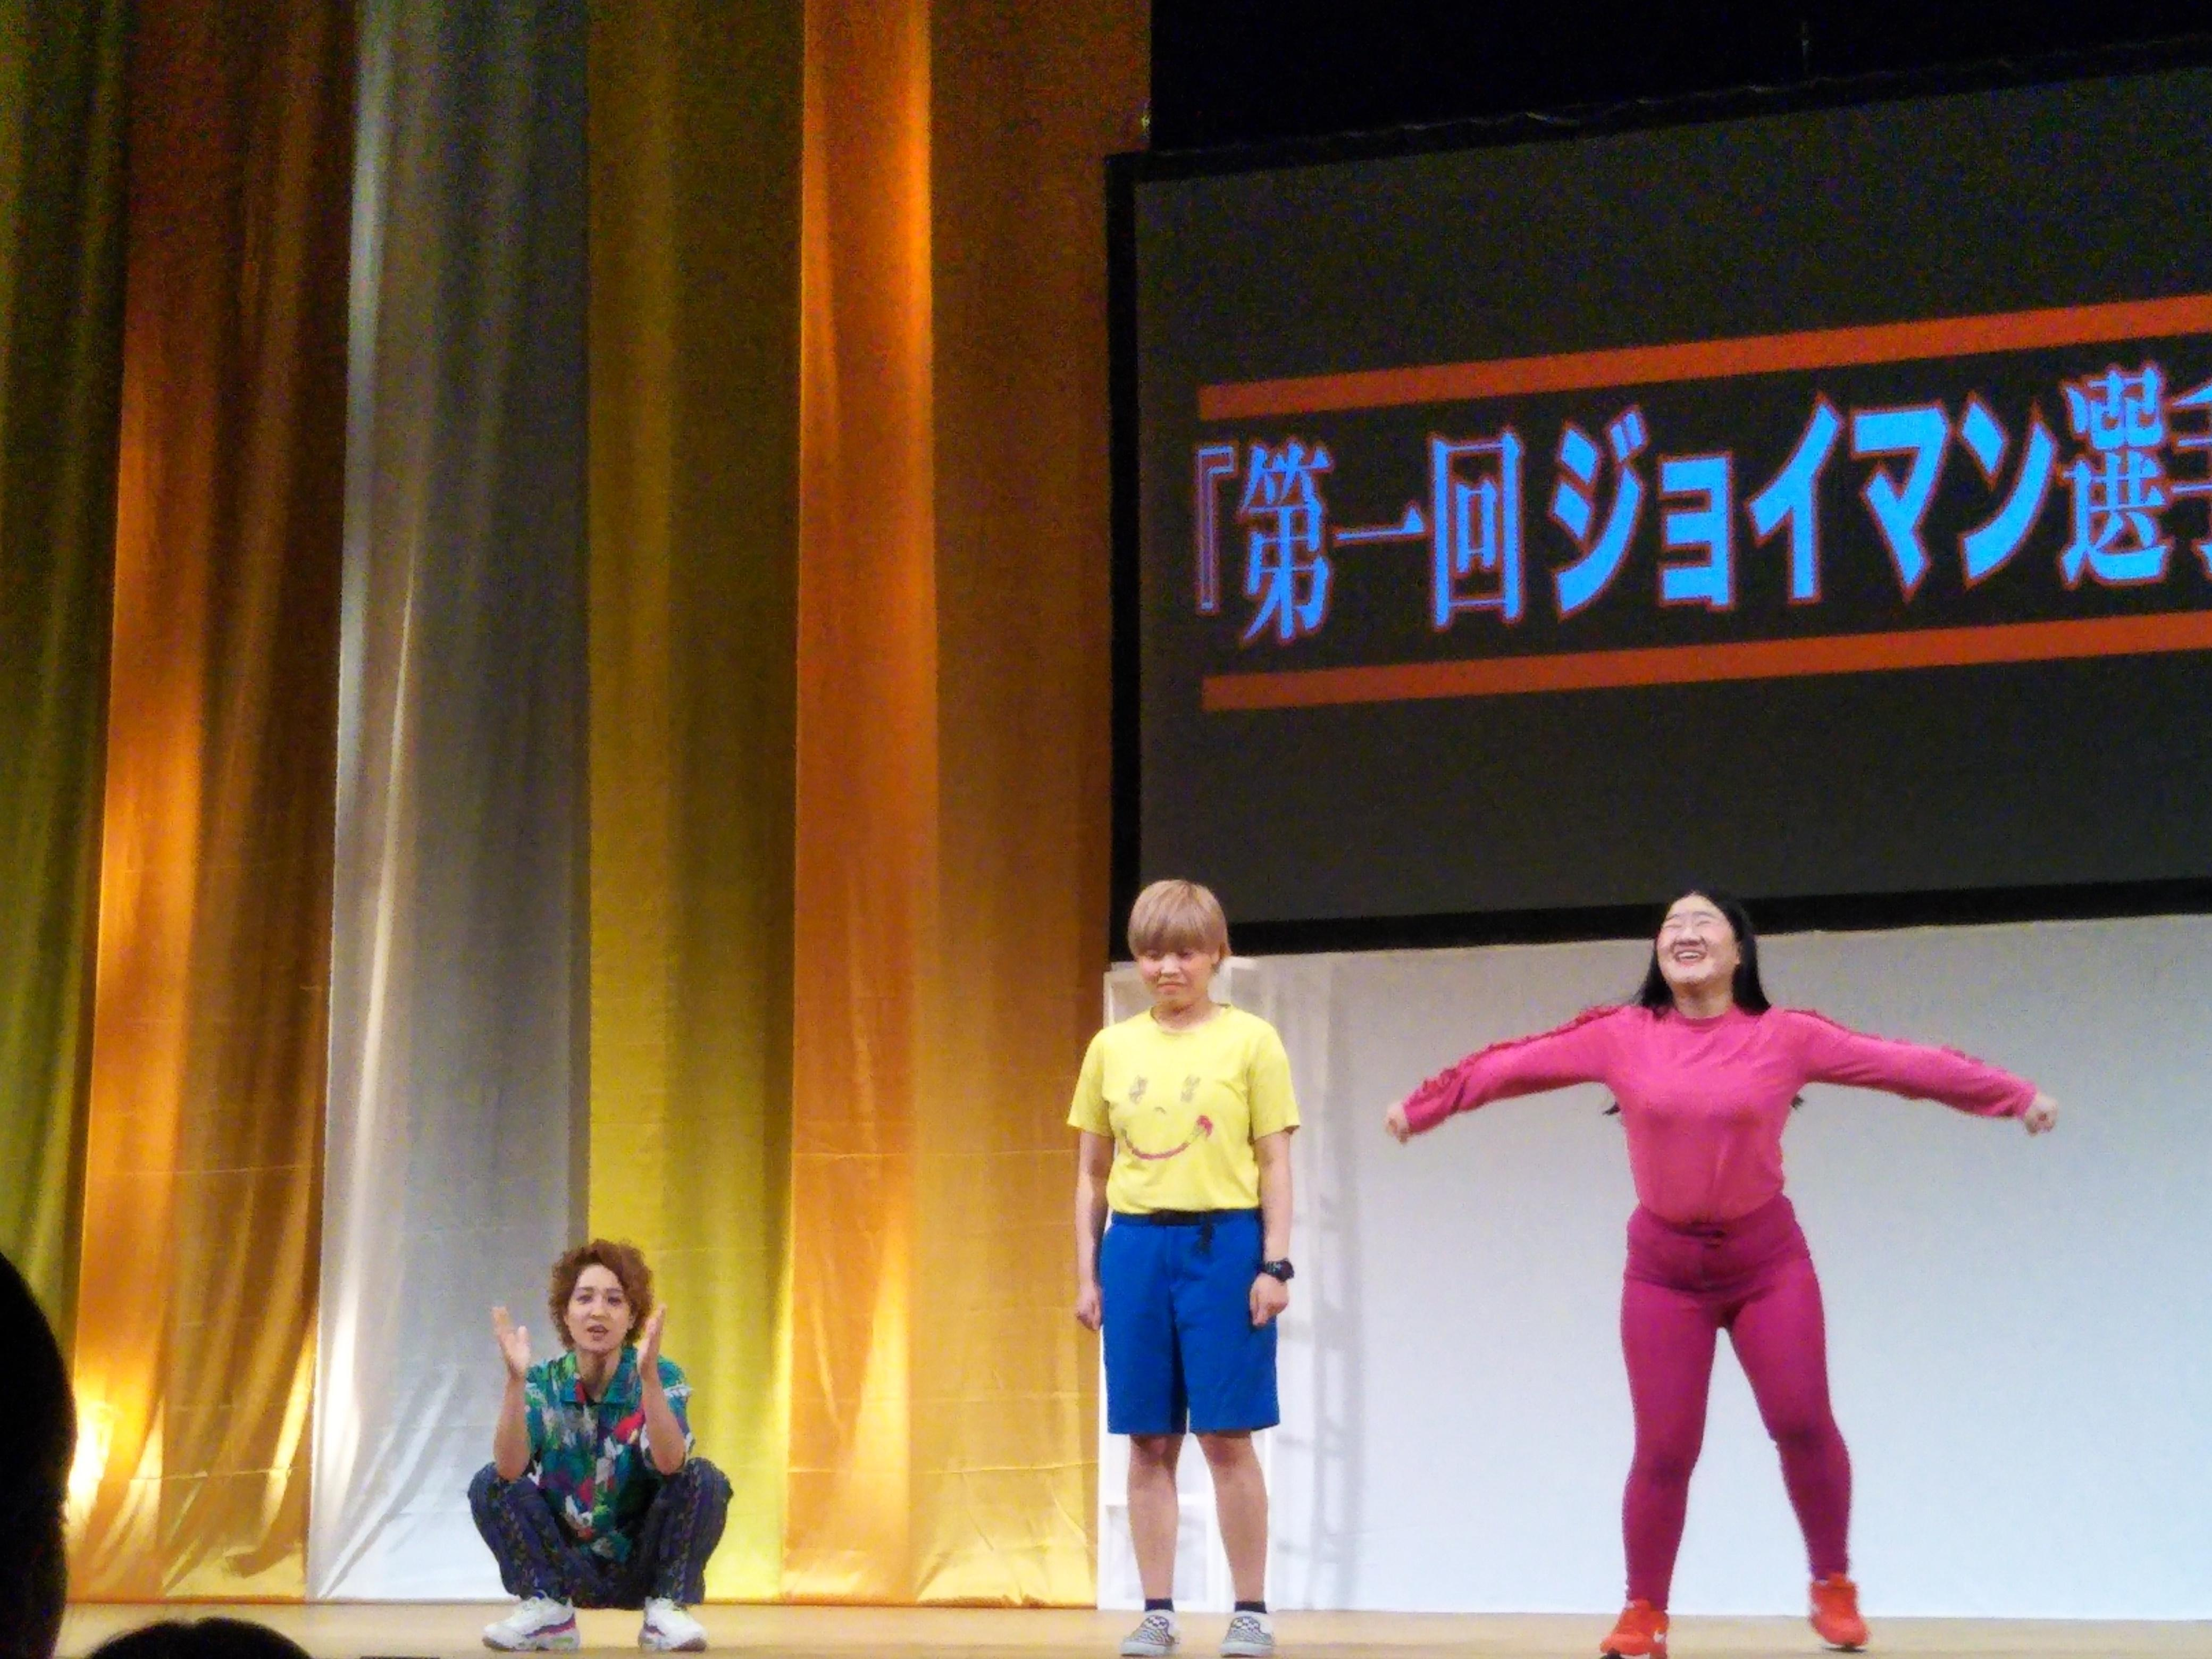 http://news.yoshimoto.co.jp/20180831104246-483aa6e8c8caaca2c95236ccbfe02d939fdbbd5c.jpg